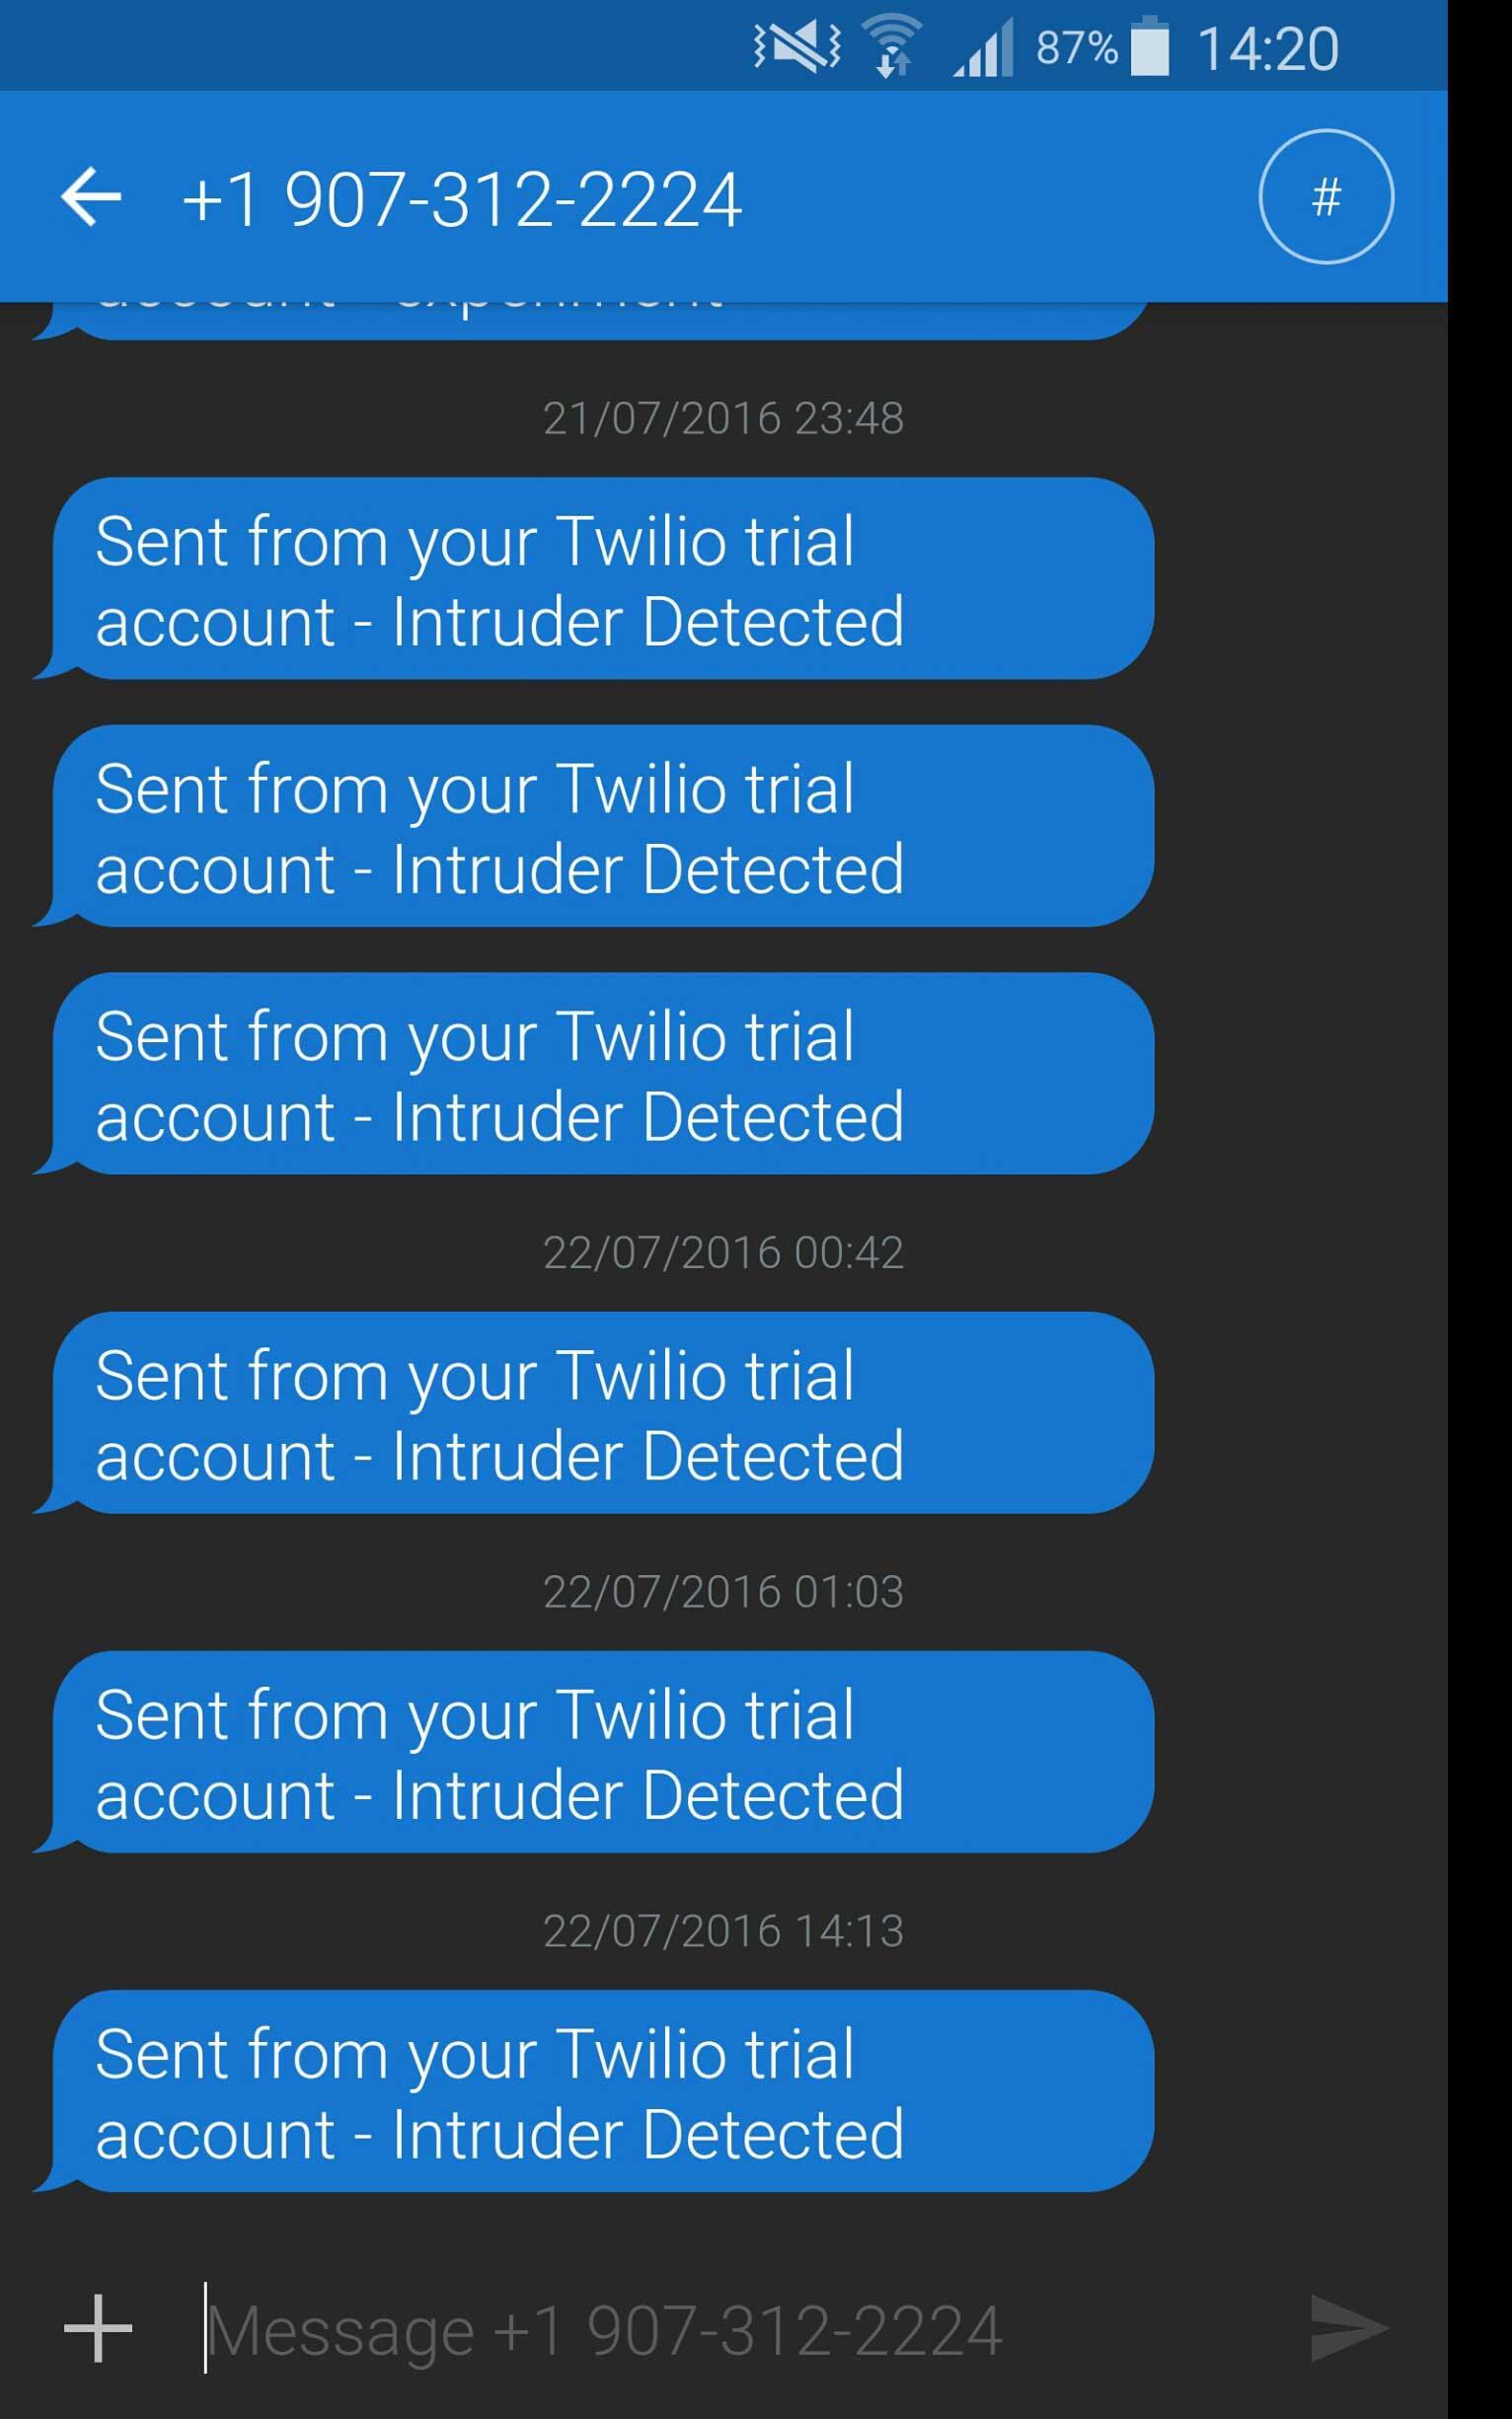 PIR_Twilio_Text_Alert_low_res